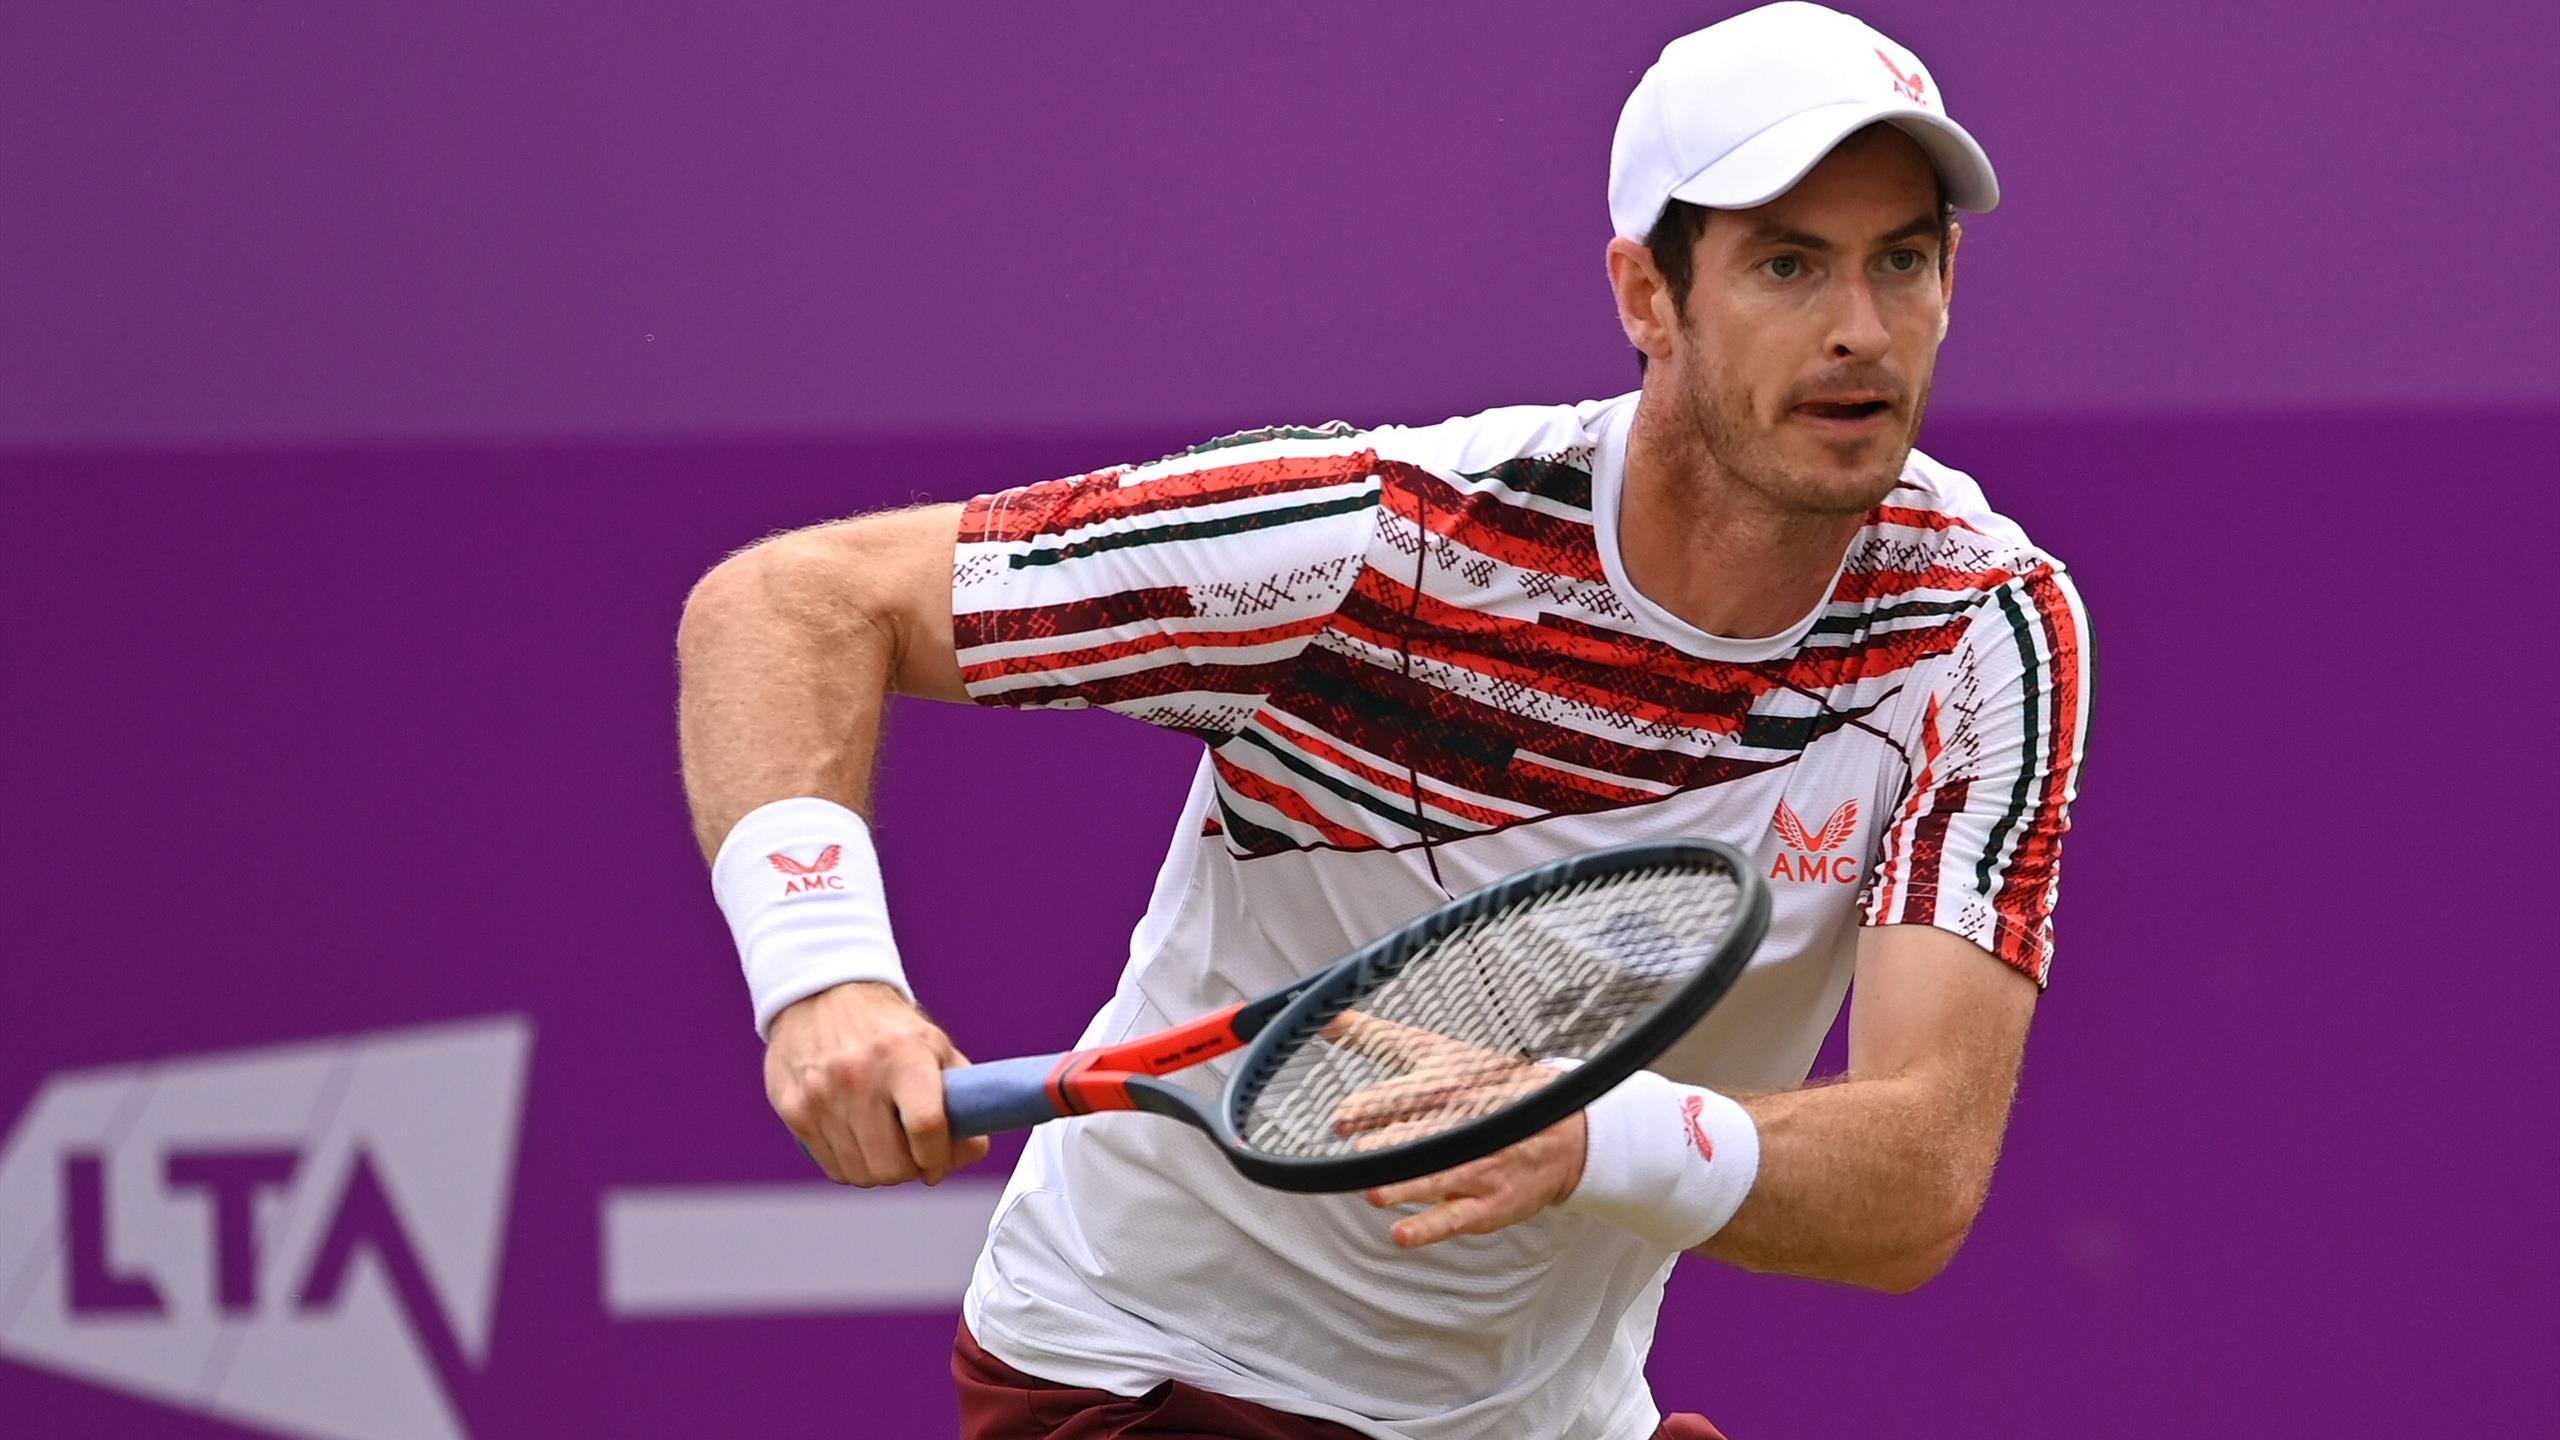 Wimbledon 2021 Tennis: Order of Play Day 1 – Andy Murray, Novak Djokovic, Iga Swiatek and Stefanos Tsistsipas in action